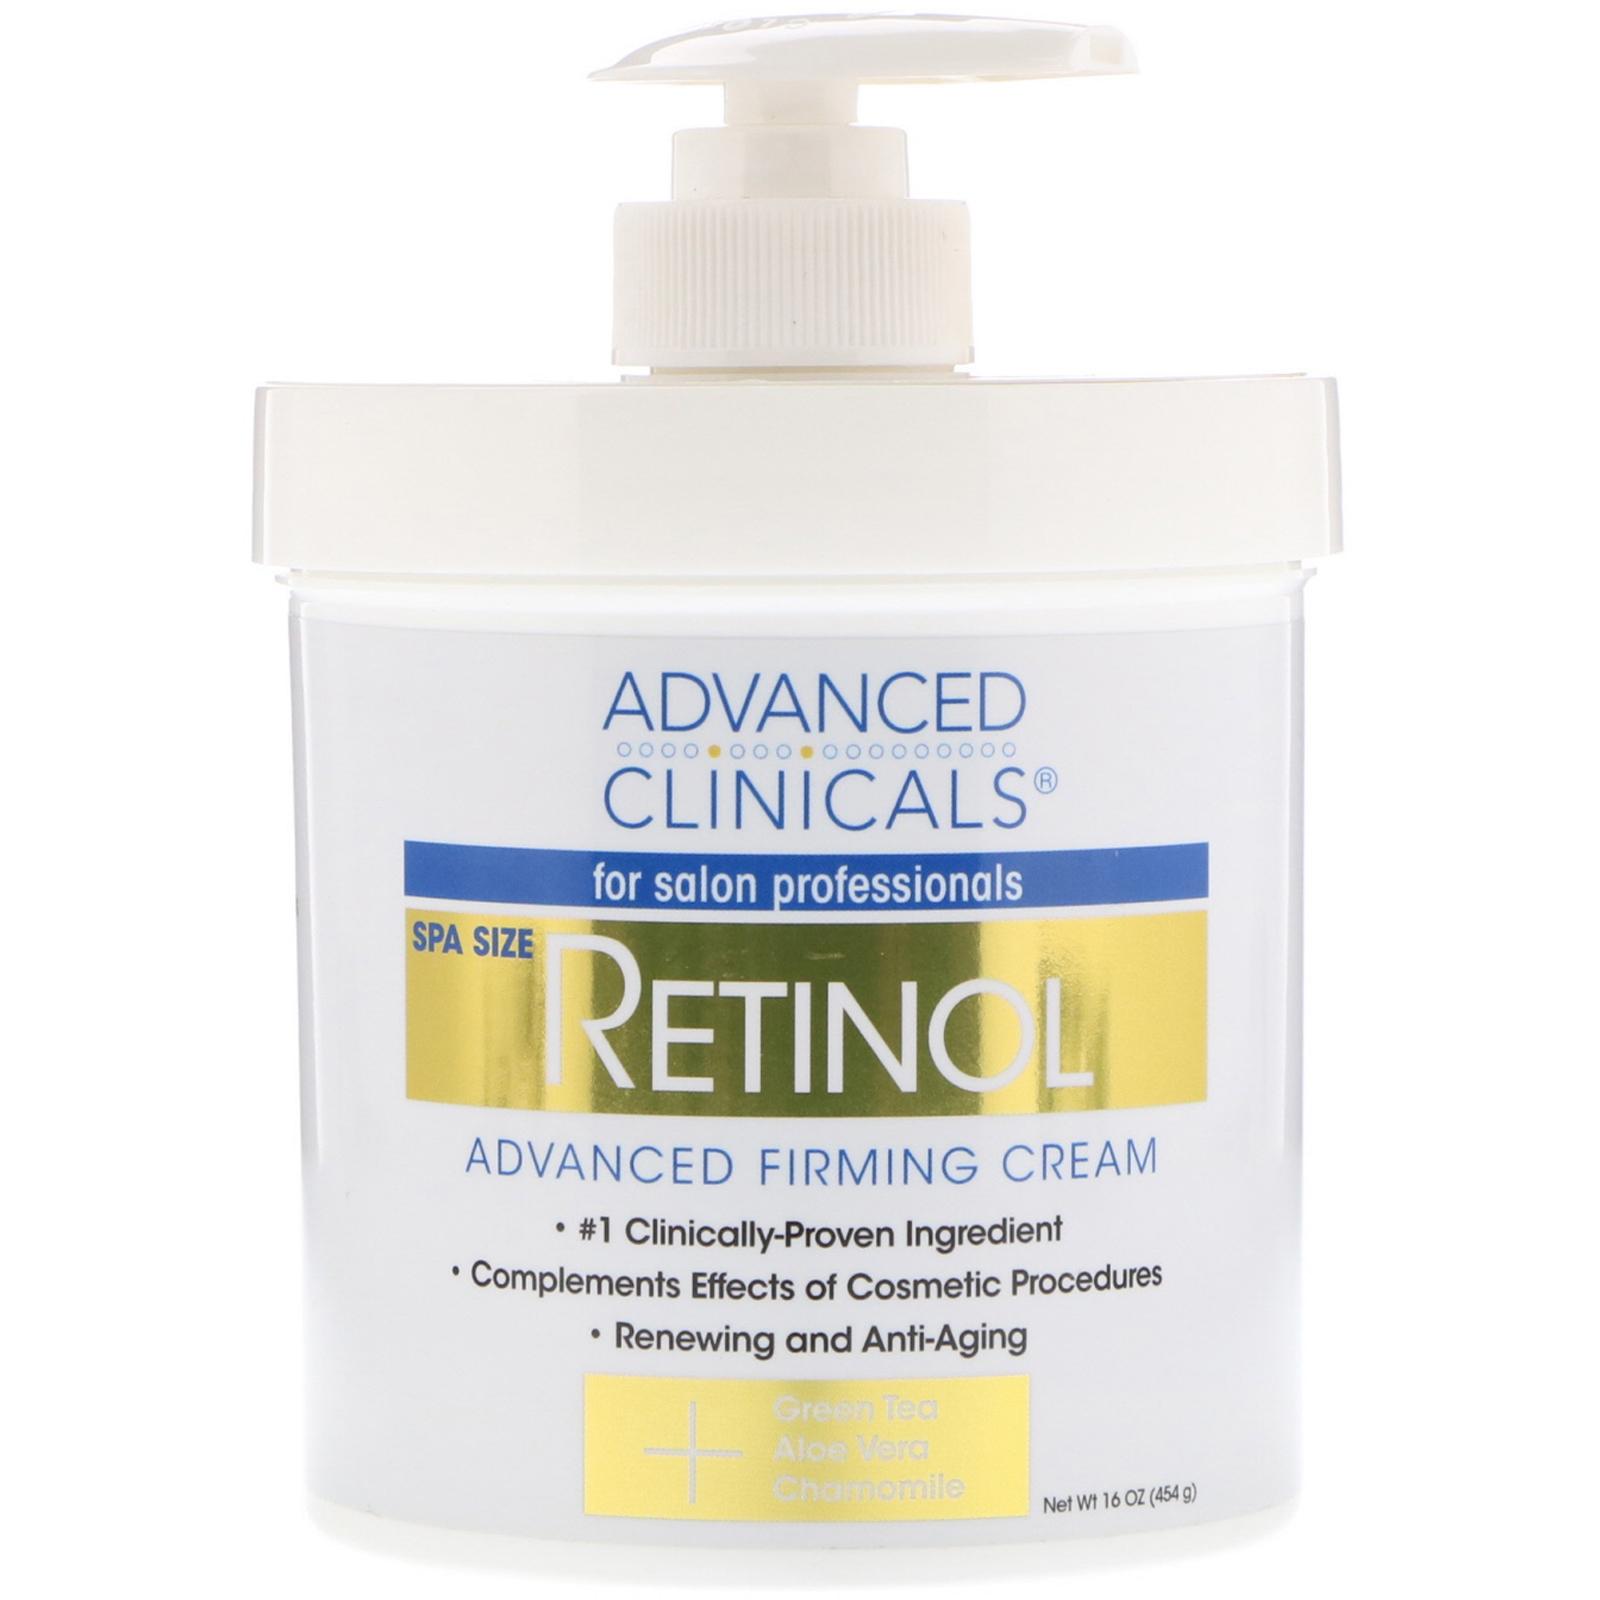 Advanced Clinicals, Retinol, Advanced Firming Cream, 16 oz